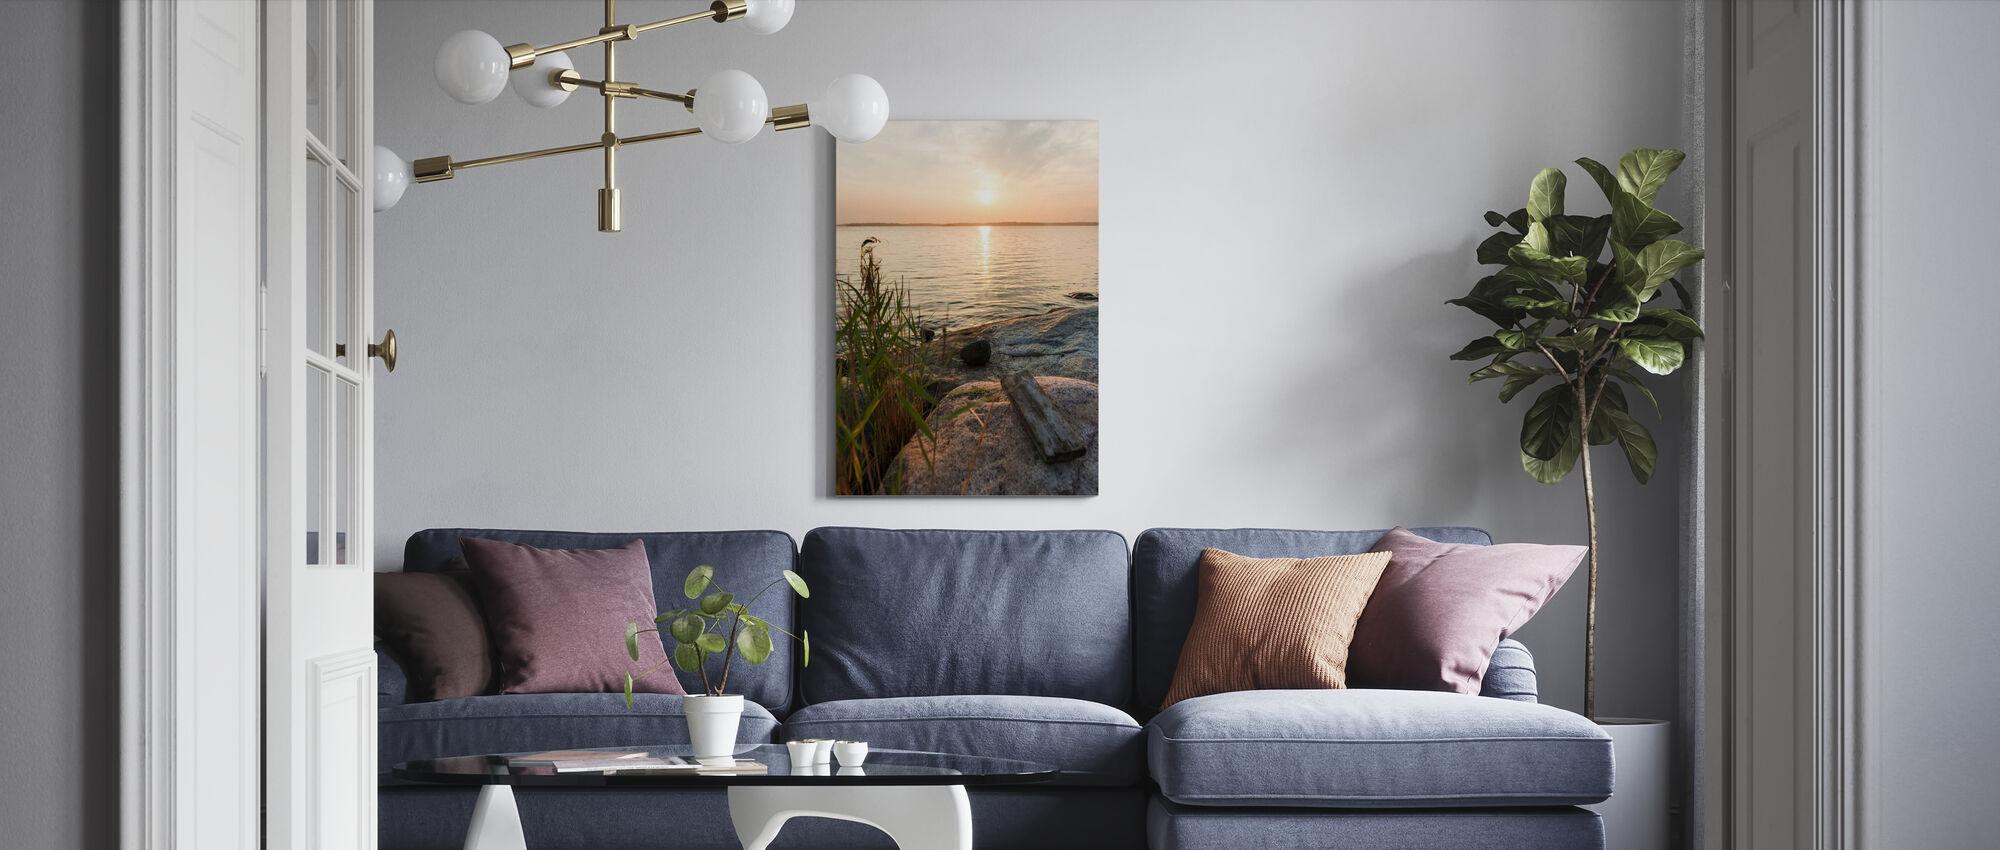 Sunset over Nässlingen, Sweden - Canvas print - Woonkamer